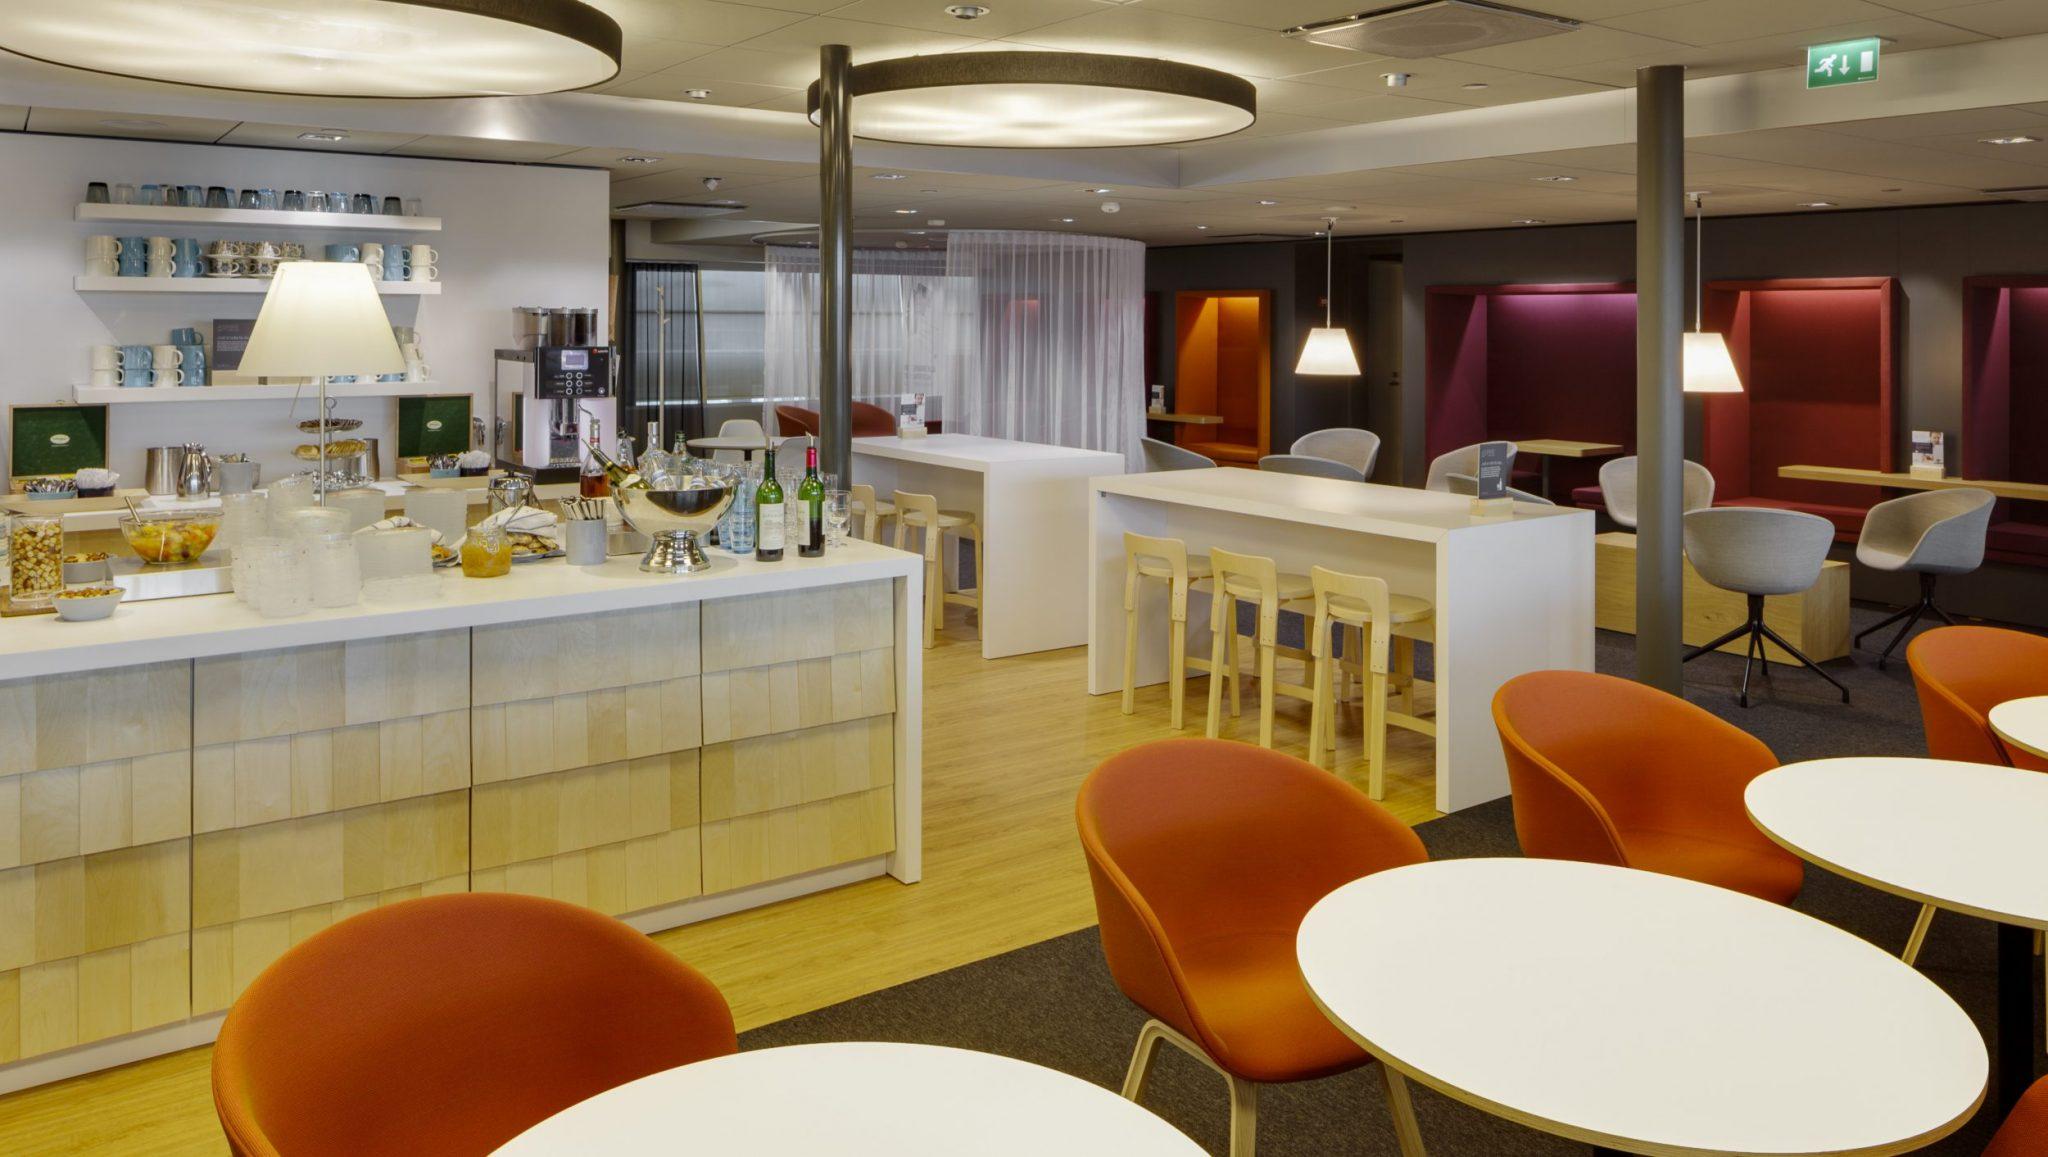 Servisair-Aspire-Airport-Lounge-Helsinki-Vantaa-GI-Project-2